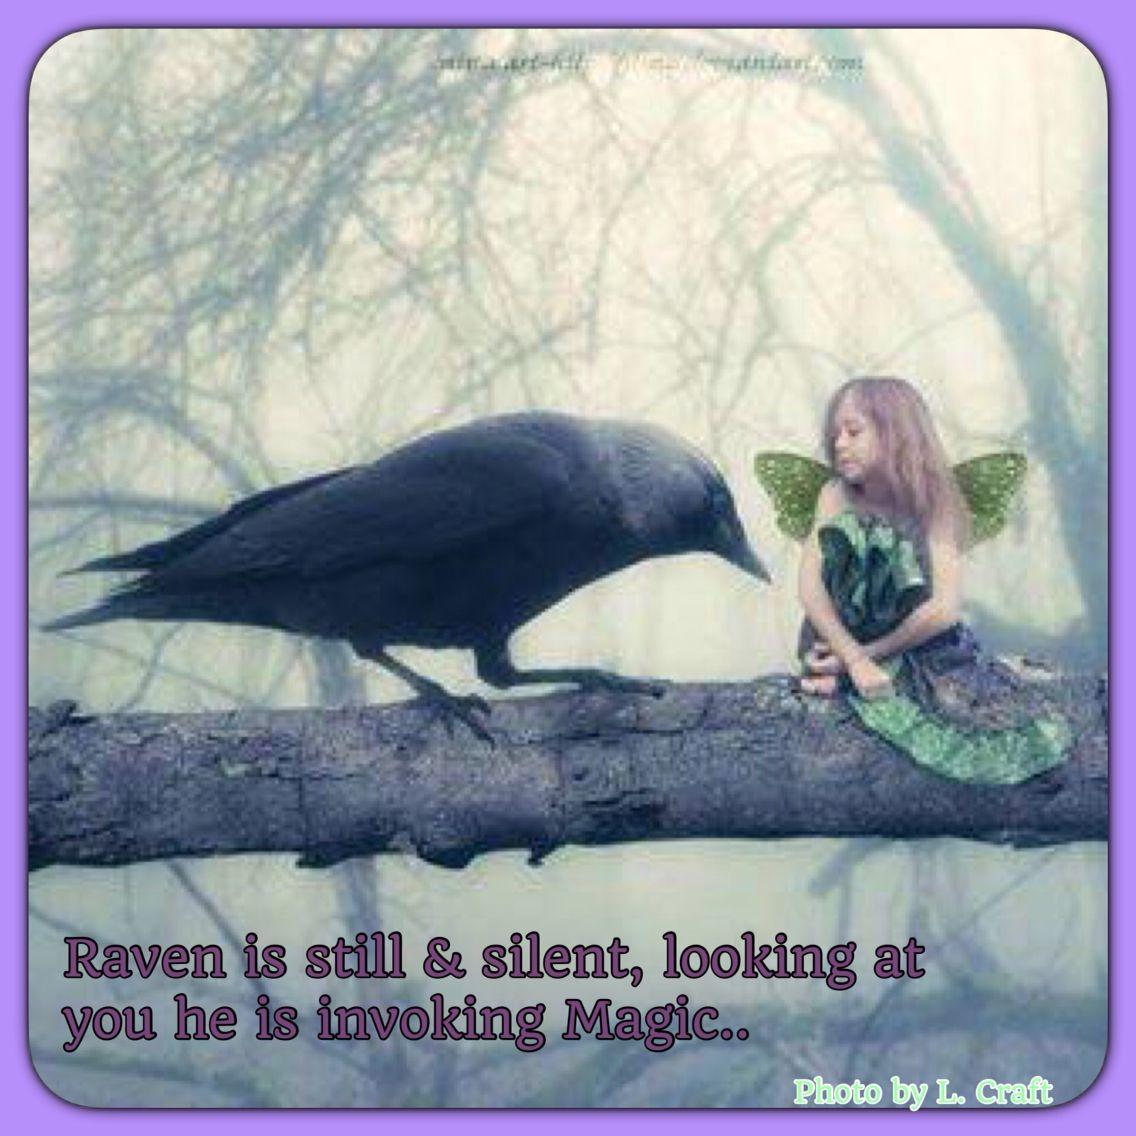 Raven Totem... Magick, Shapeshifting, Distant Healing